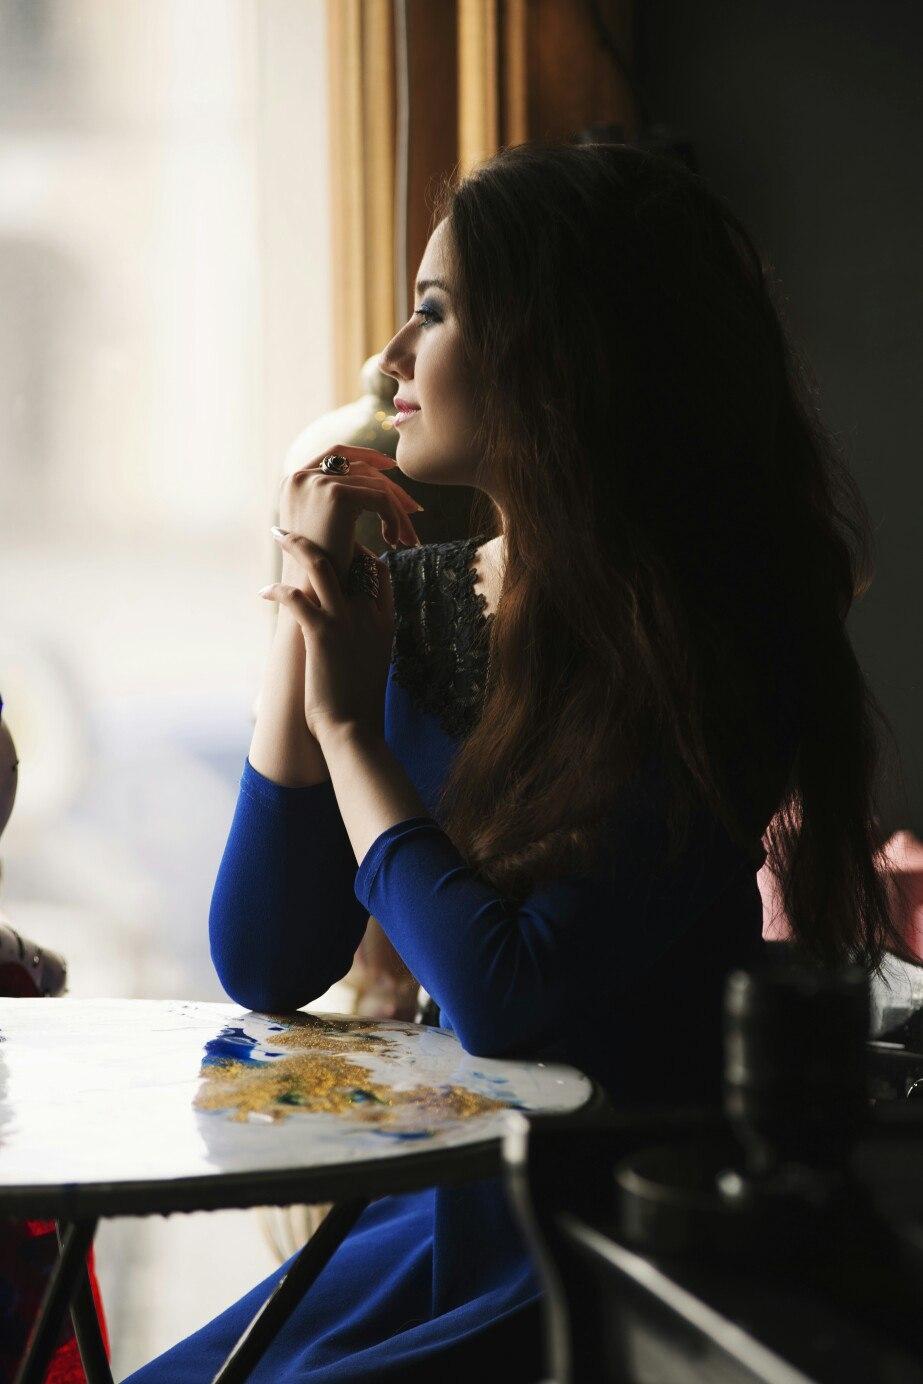 [i]Photographer: [url=http://sheina.spb.ru/]Анастасия Шеина[/url] rnMUA: [url=https://vk.com/absoluteabyss]Ангелина Фесла[/url]rnMd: [url=https://vk.com/dayana_kraider]Даяна Крайдер[/url]rnLocation: Ma Maison De Delicatessern2017[/i]